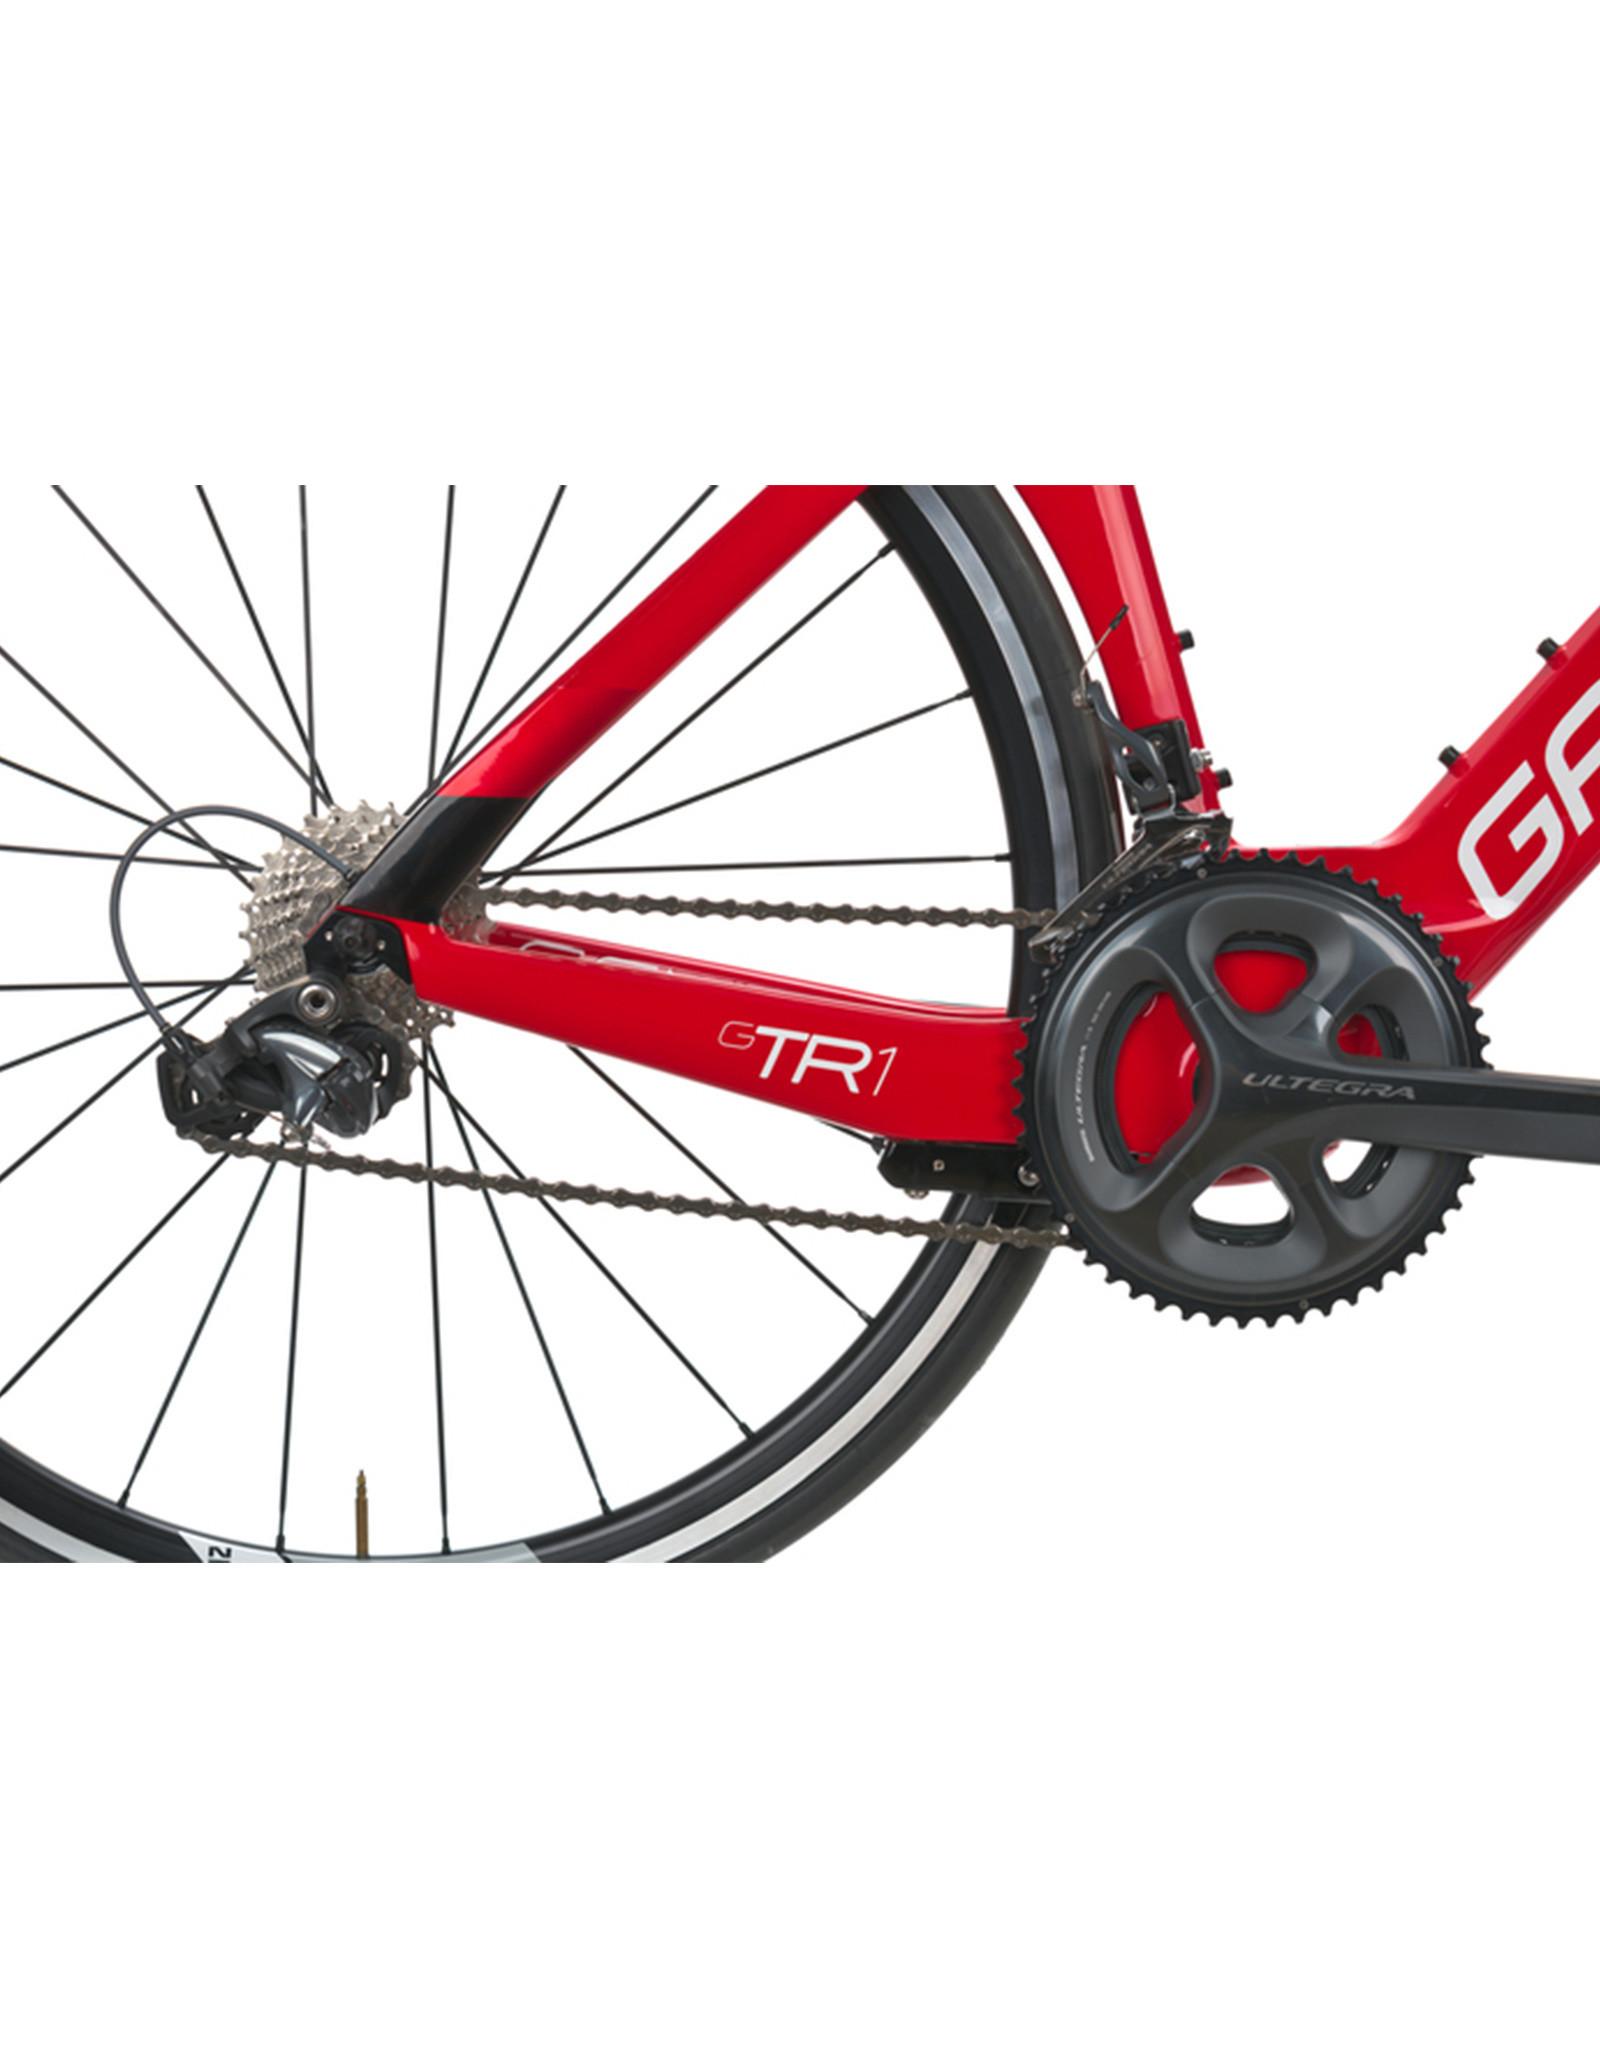 Garneau Garneau Vélo Gennix TR1 Perf. Rouge/Noir S